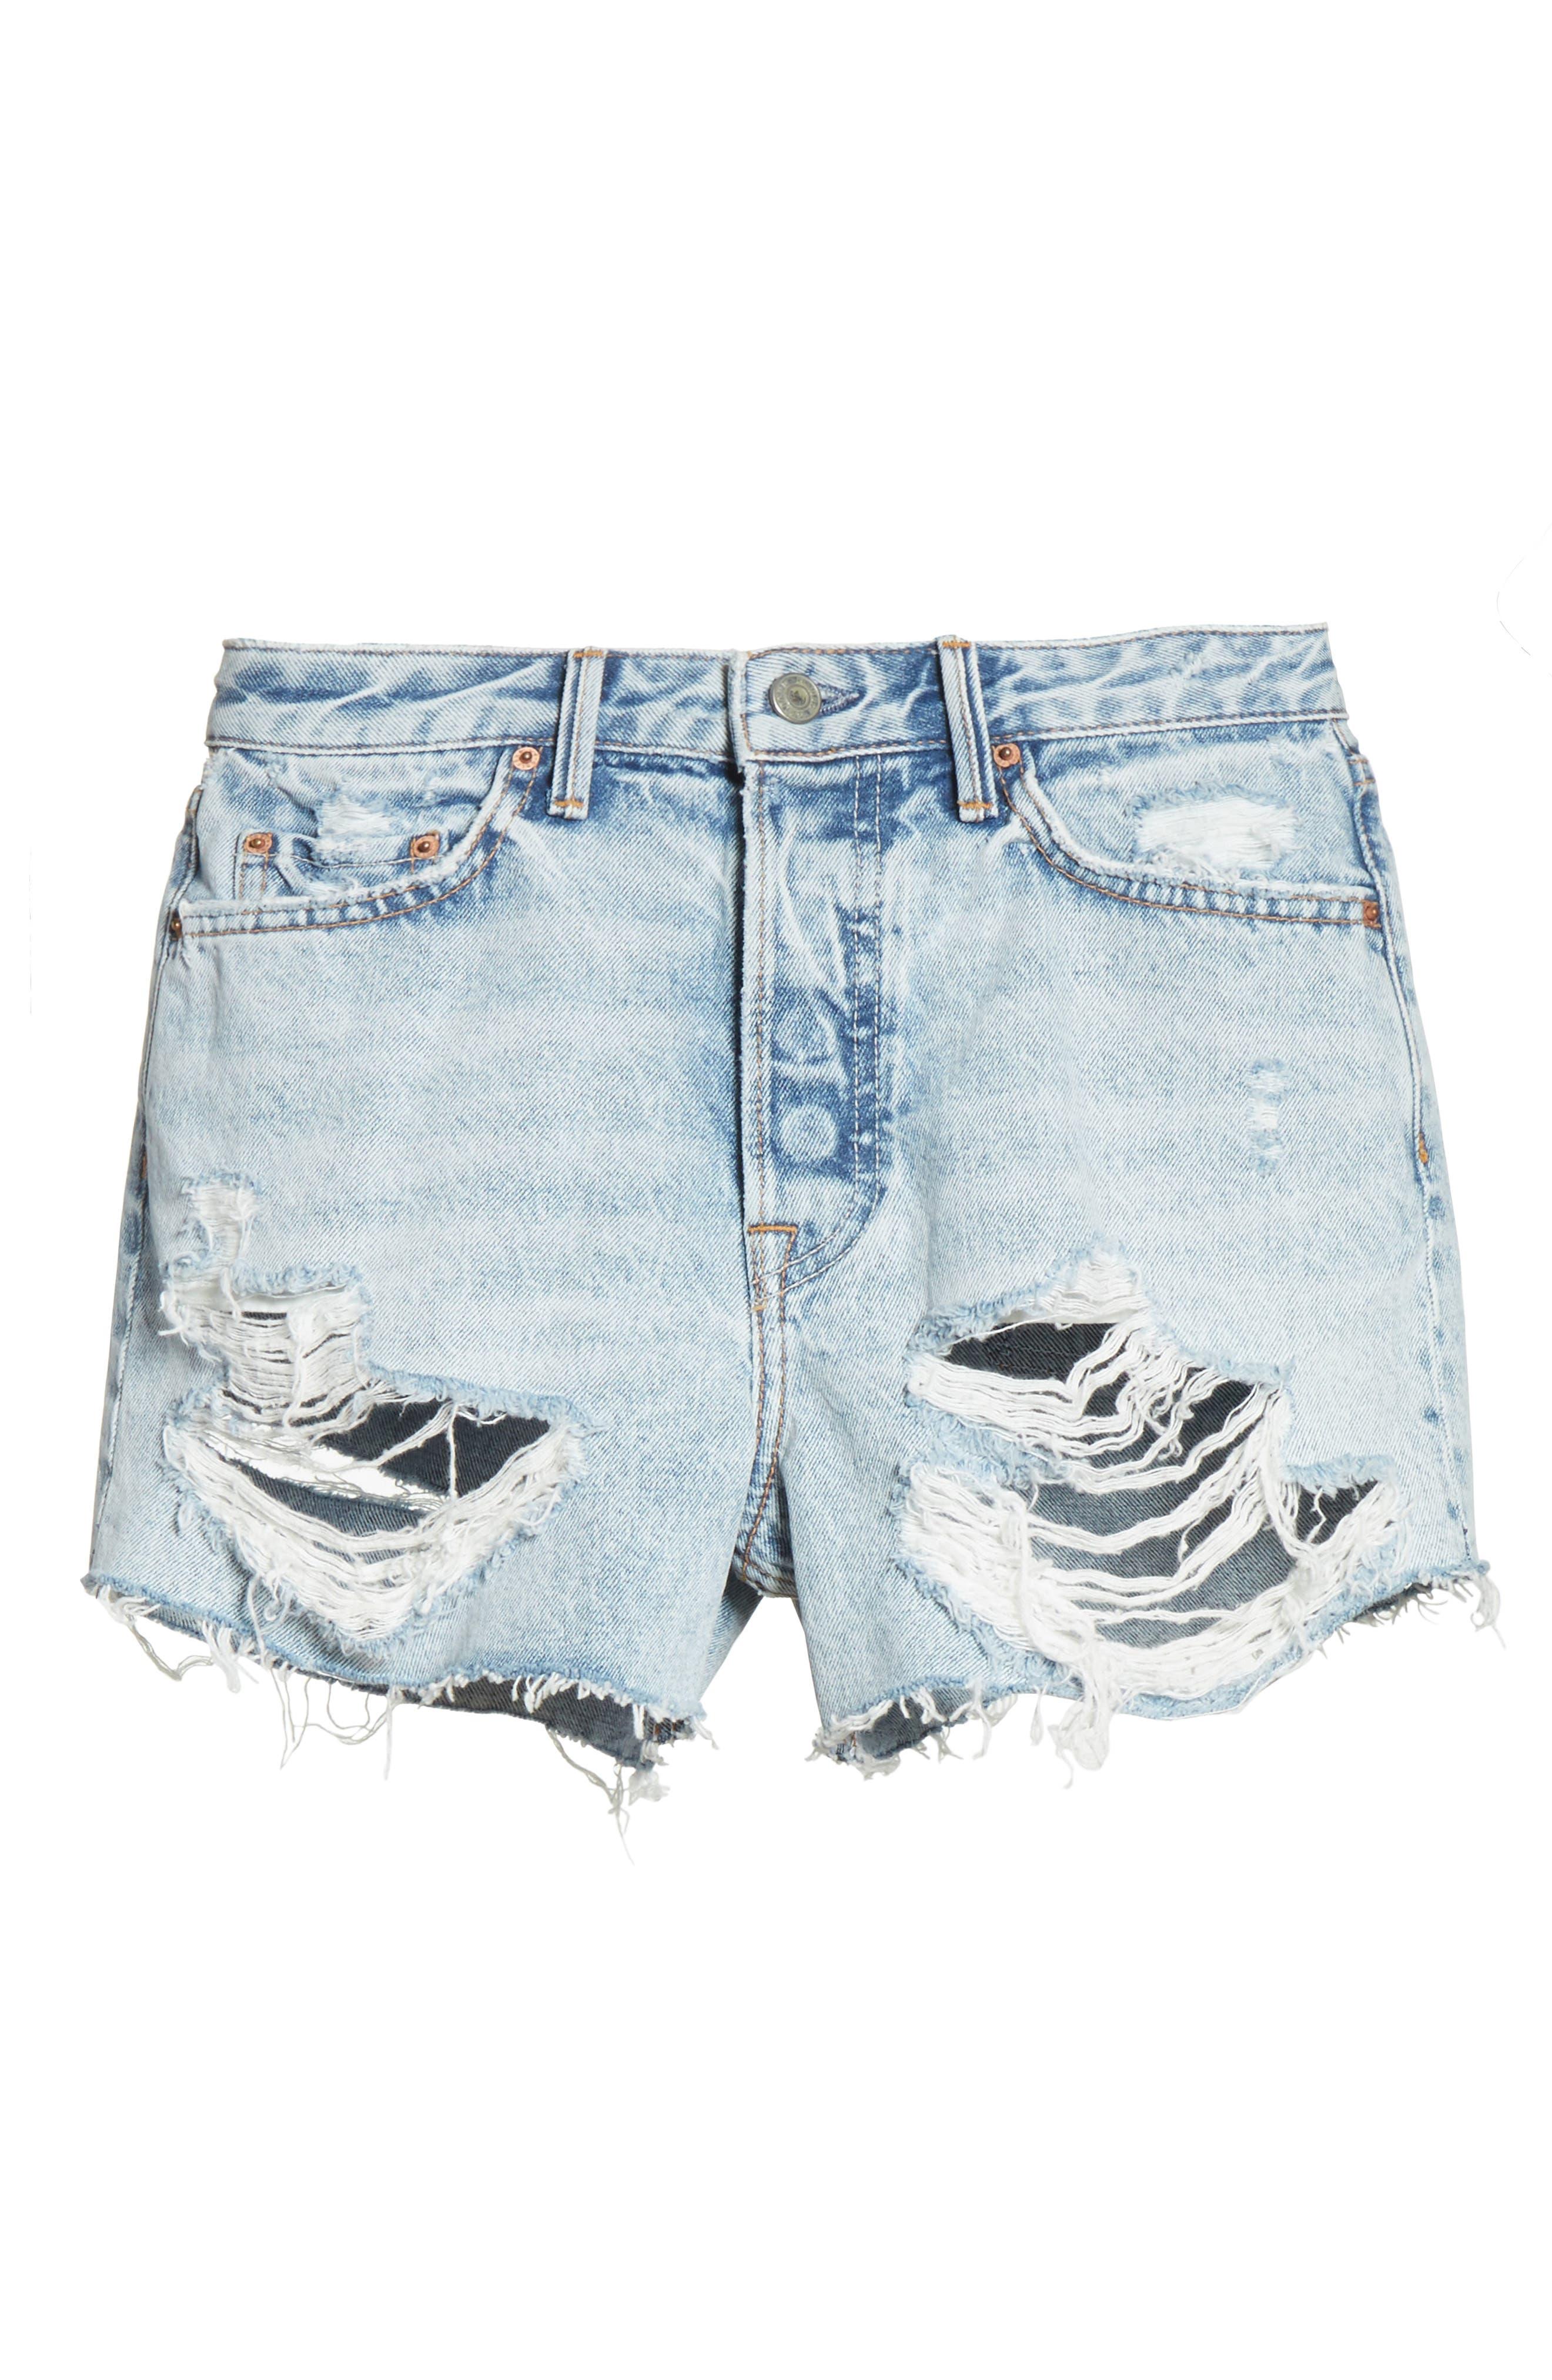 Helena Ripped Denim Shorts,                             Alternate thumbnail 6, color,                             Acetone